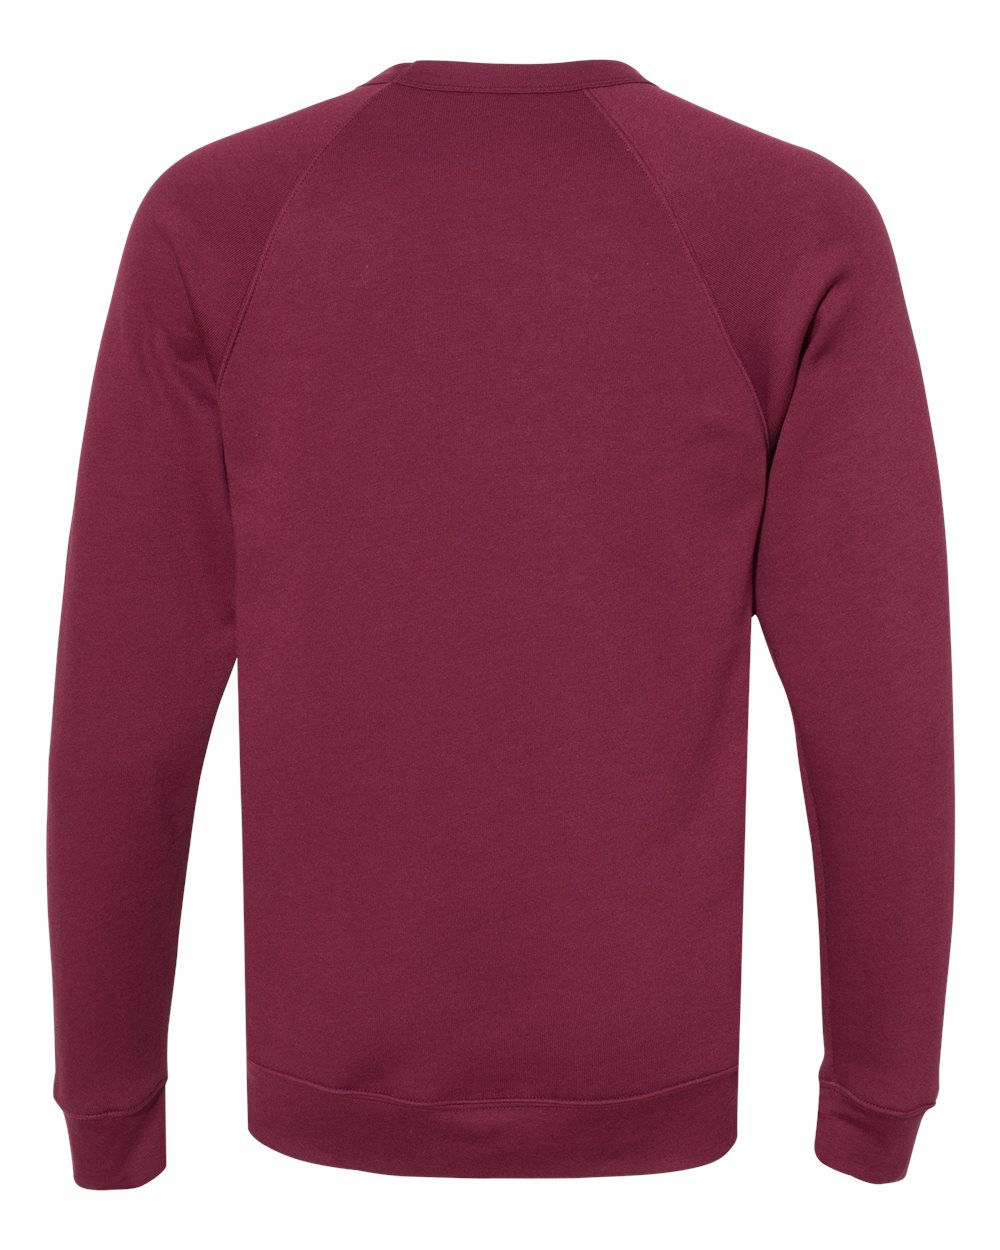 Bella-Canvas-Unisex-Sponge-Fleece-Crewneck-Sweatshirt-Top-Blank-3901-up-to-2XL thumbnail 47